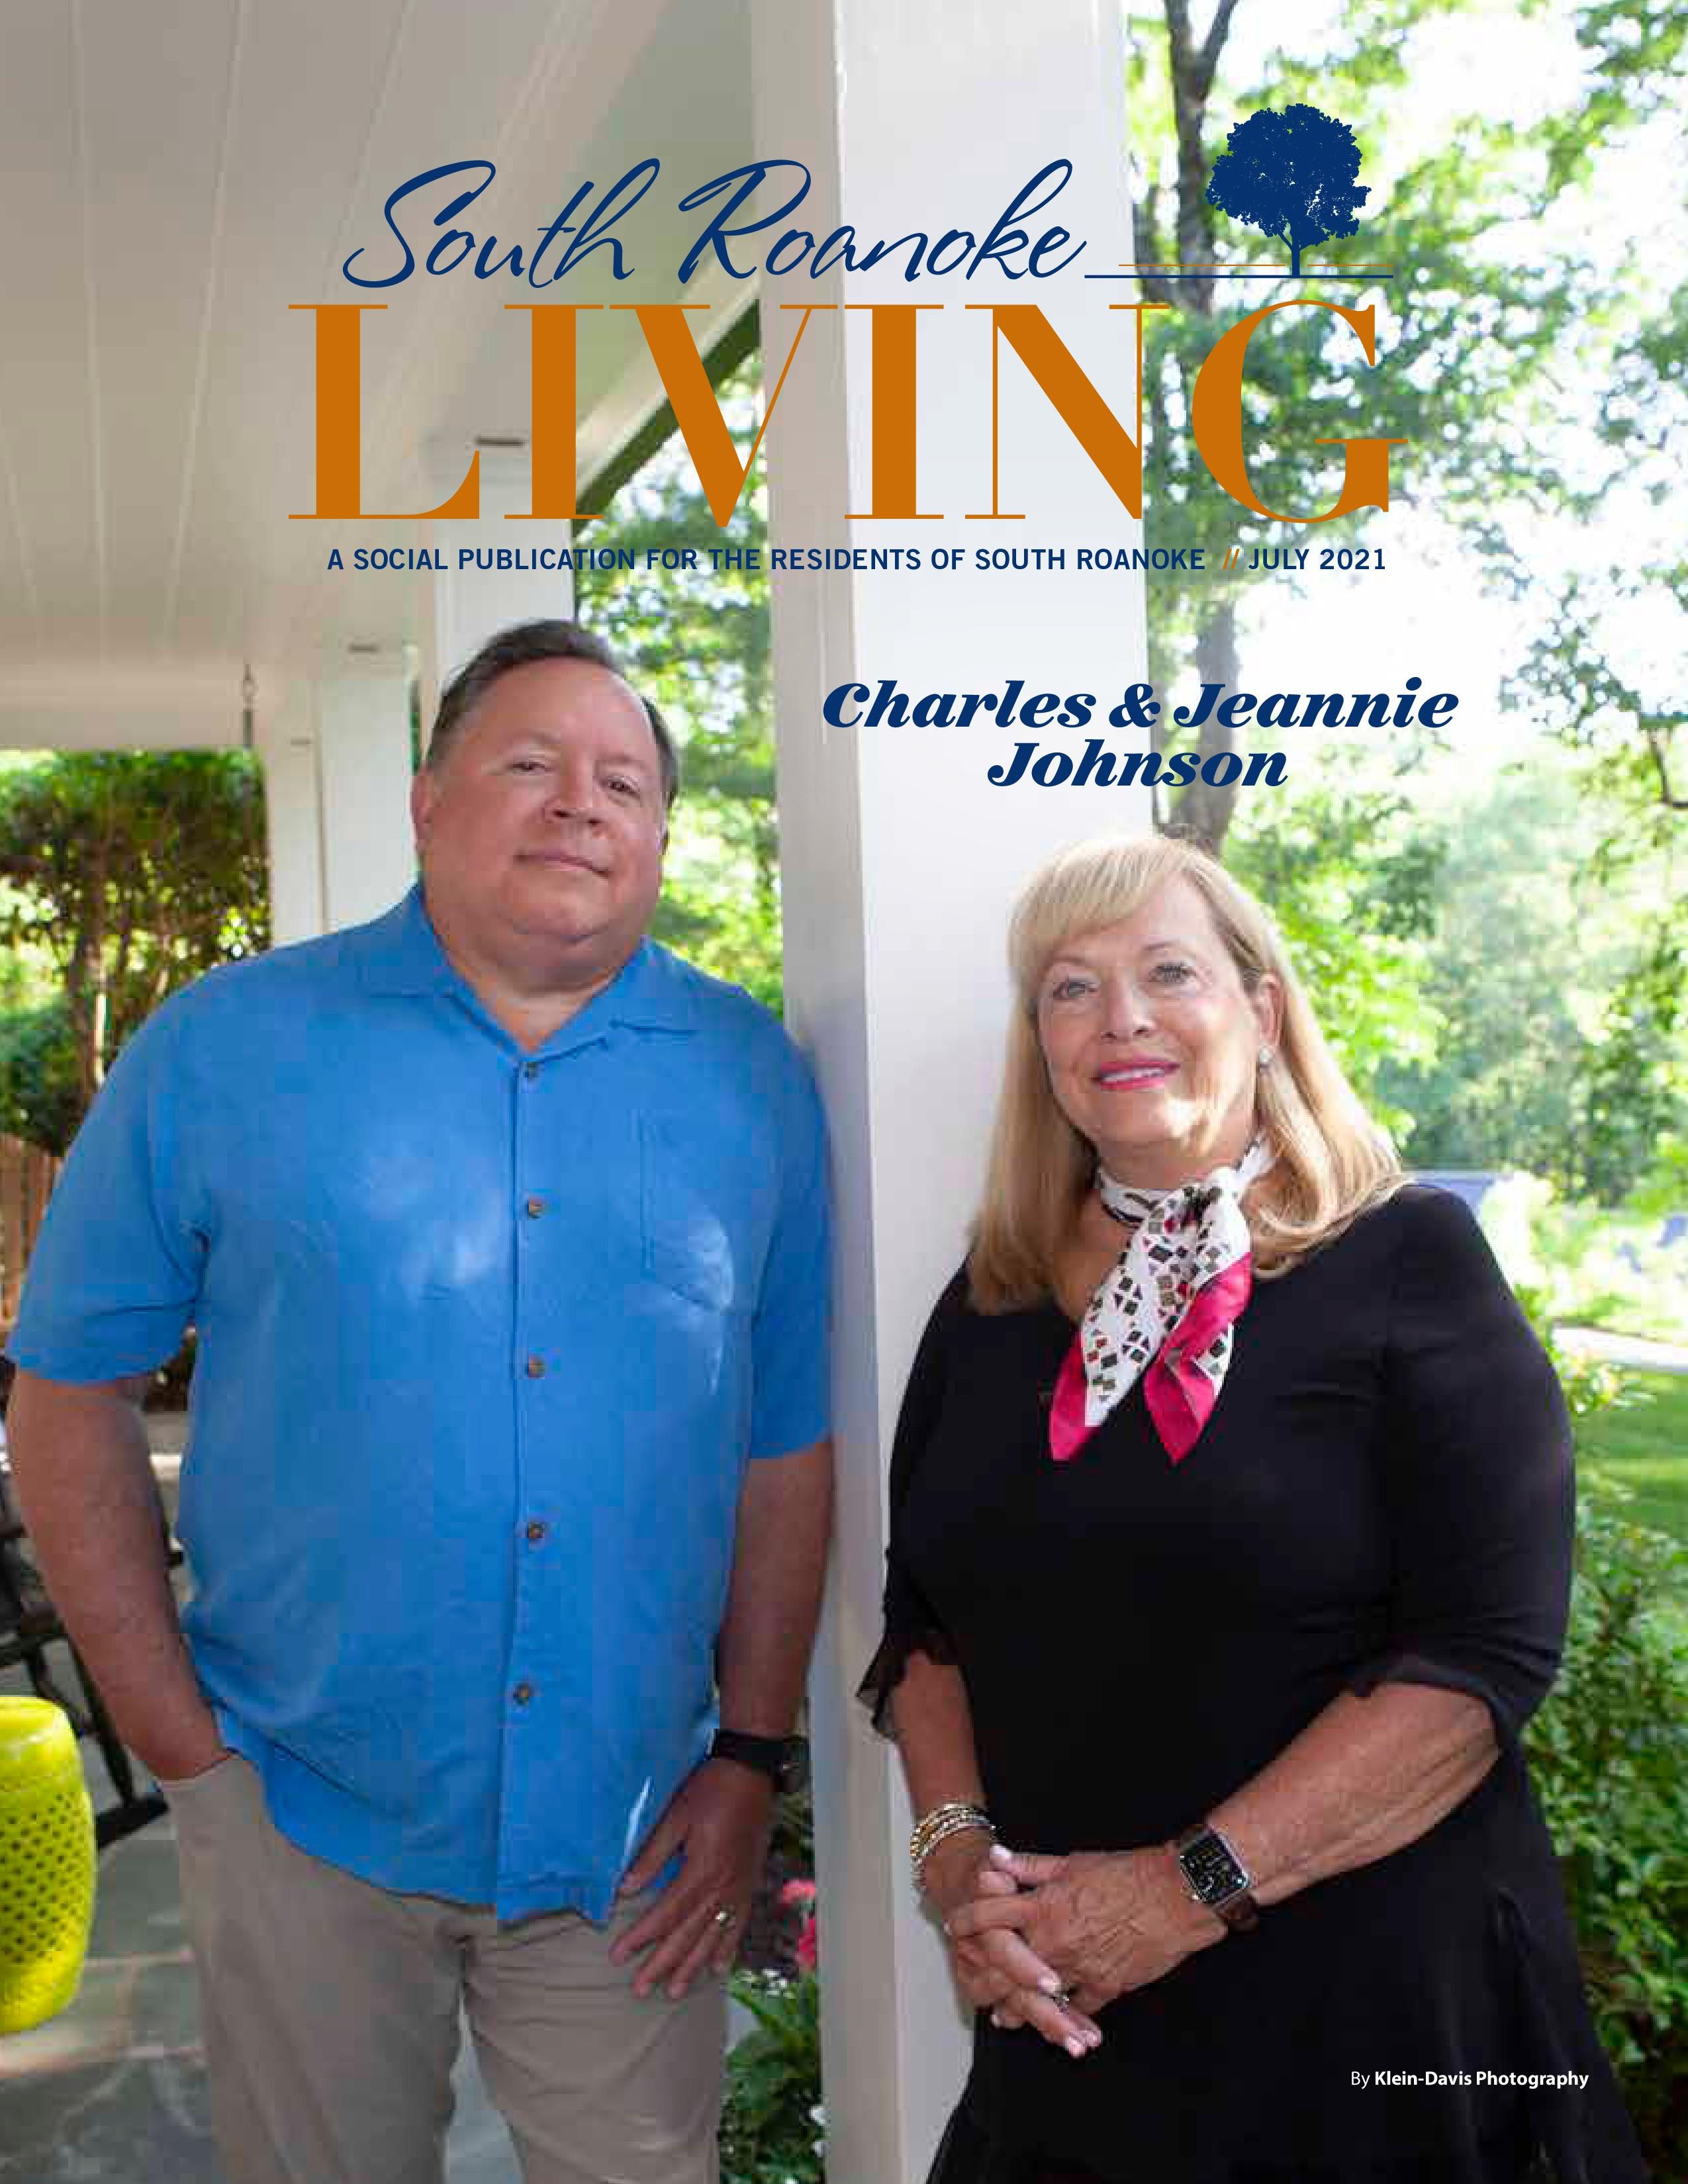 South Roanoke Living 2021-07-01